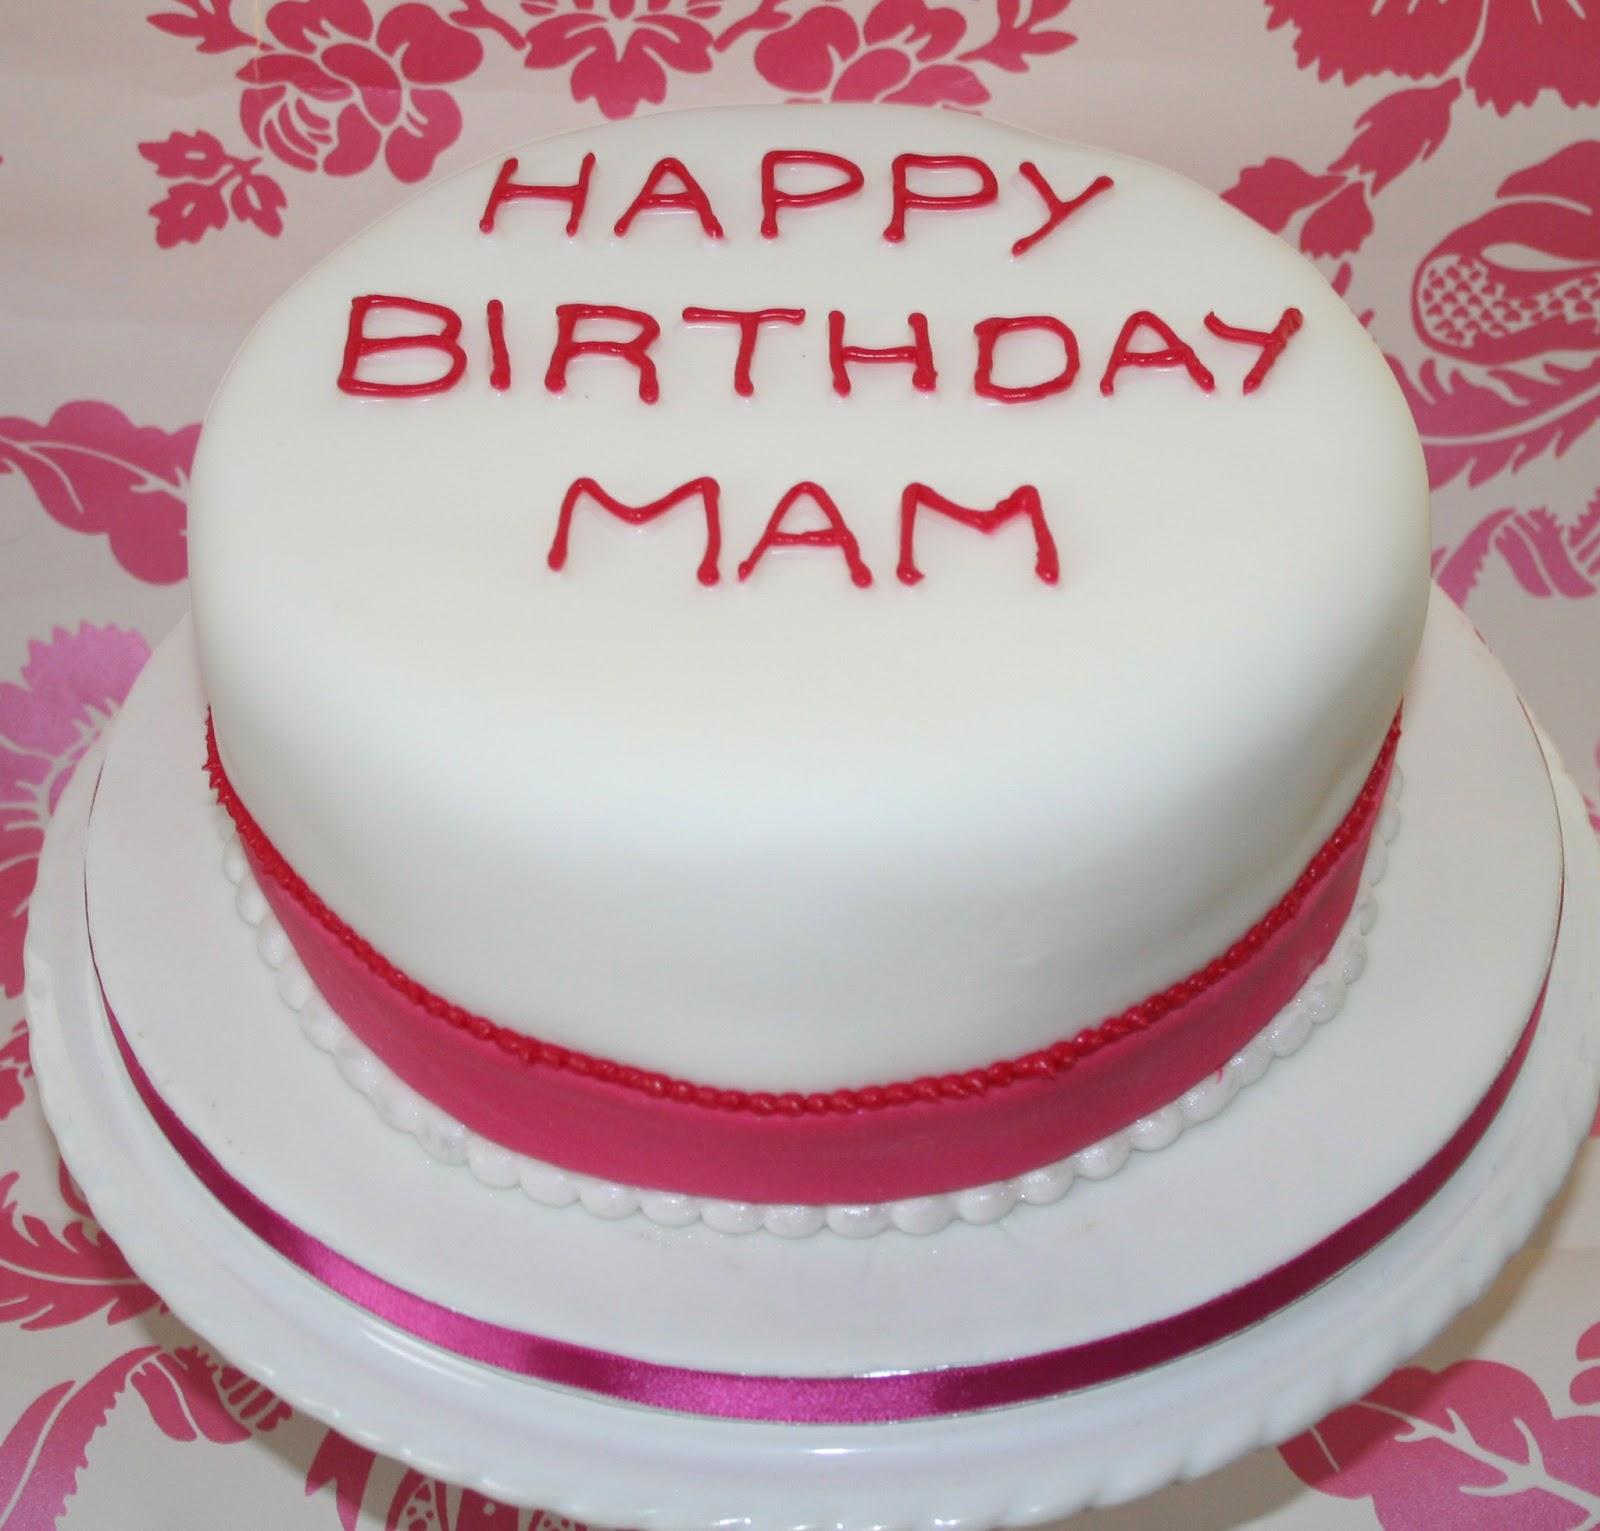 Photos Of White Birthday Cake : Chintzy Cakes: Pink and White Birthday Cake